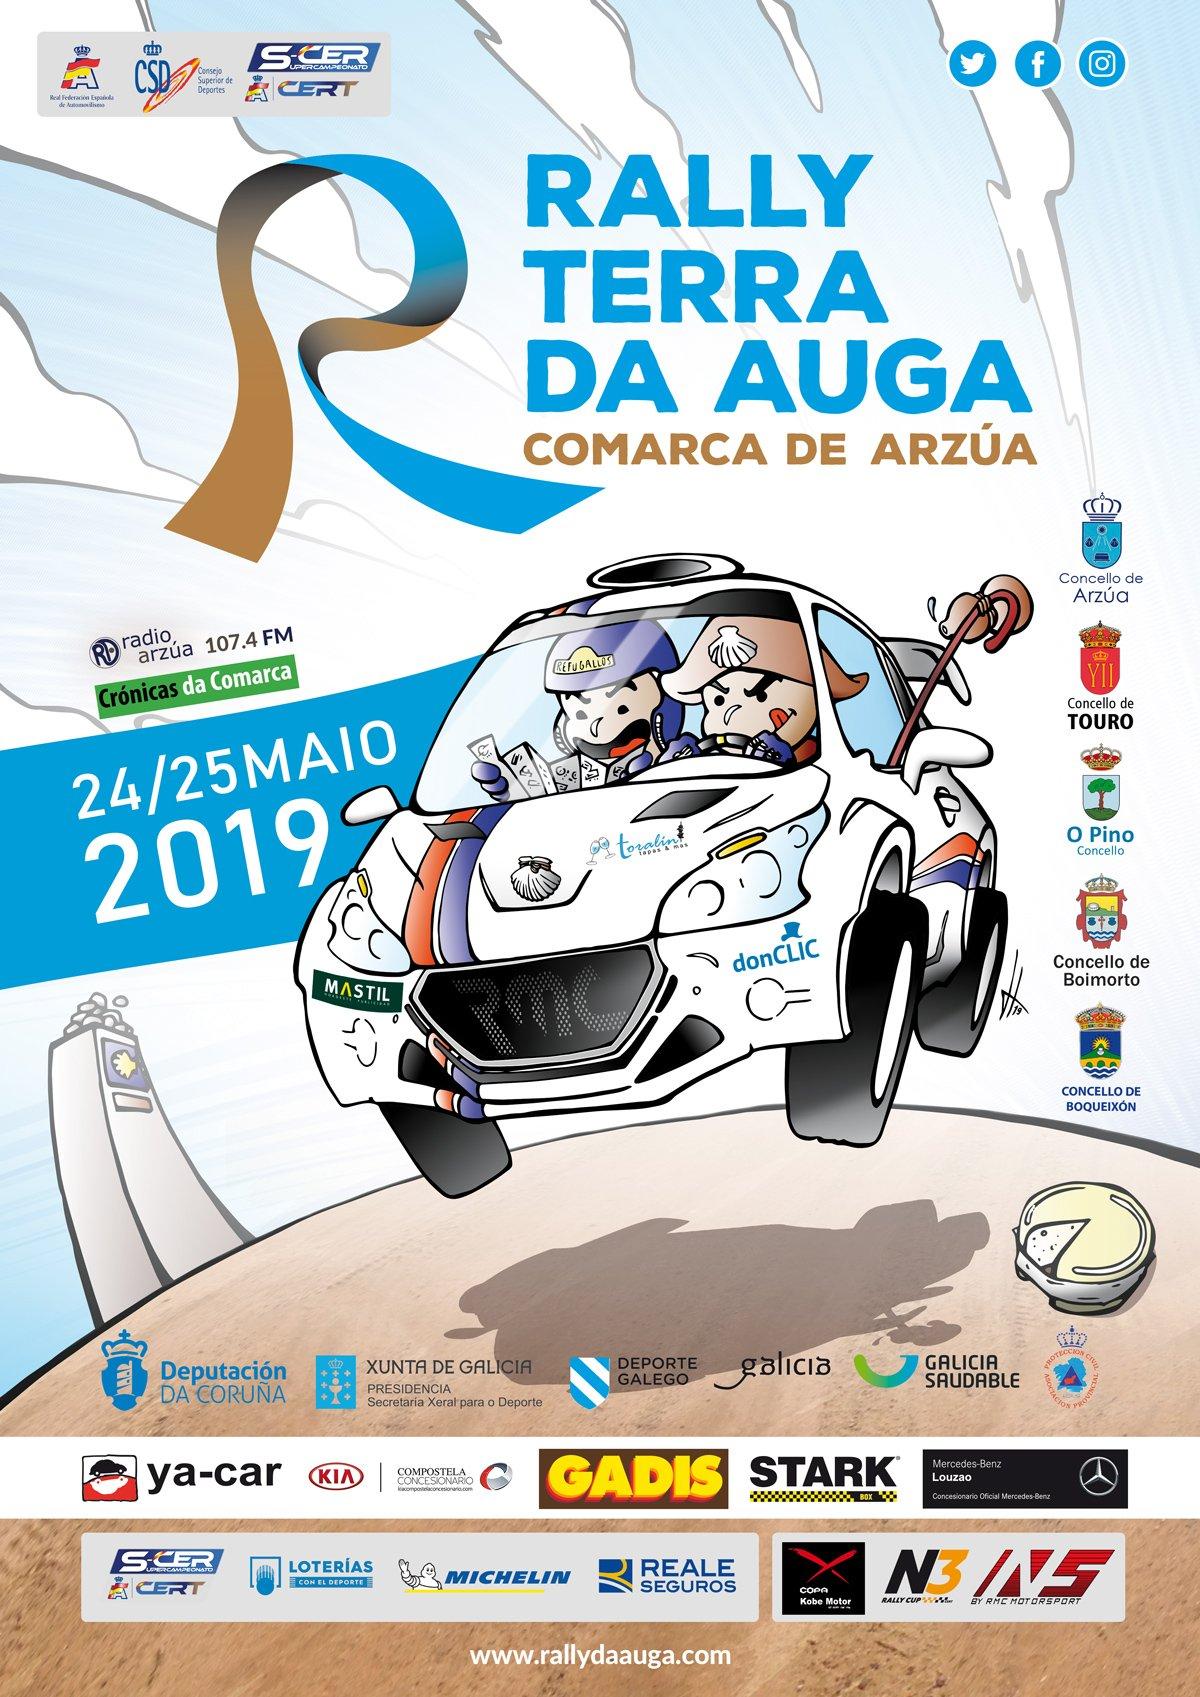 SCER + CERT: Rallye Terra da Auga - Comarca de Arzúa [24-25 Mayo] D5_A1ZUWsAA_0ET